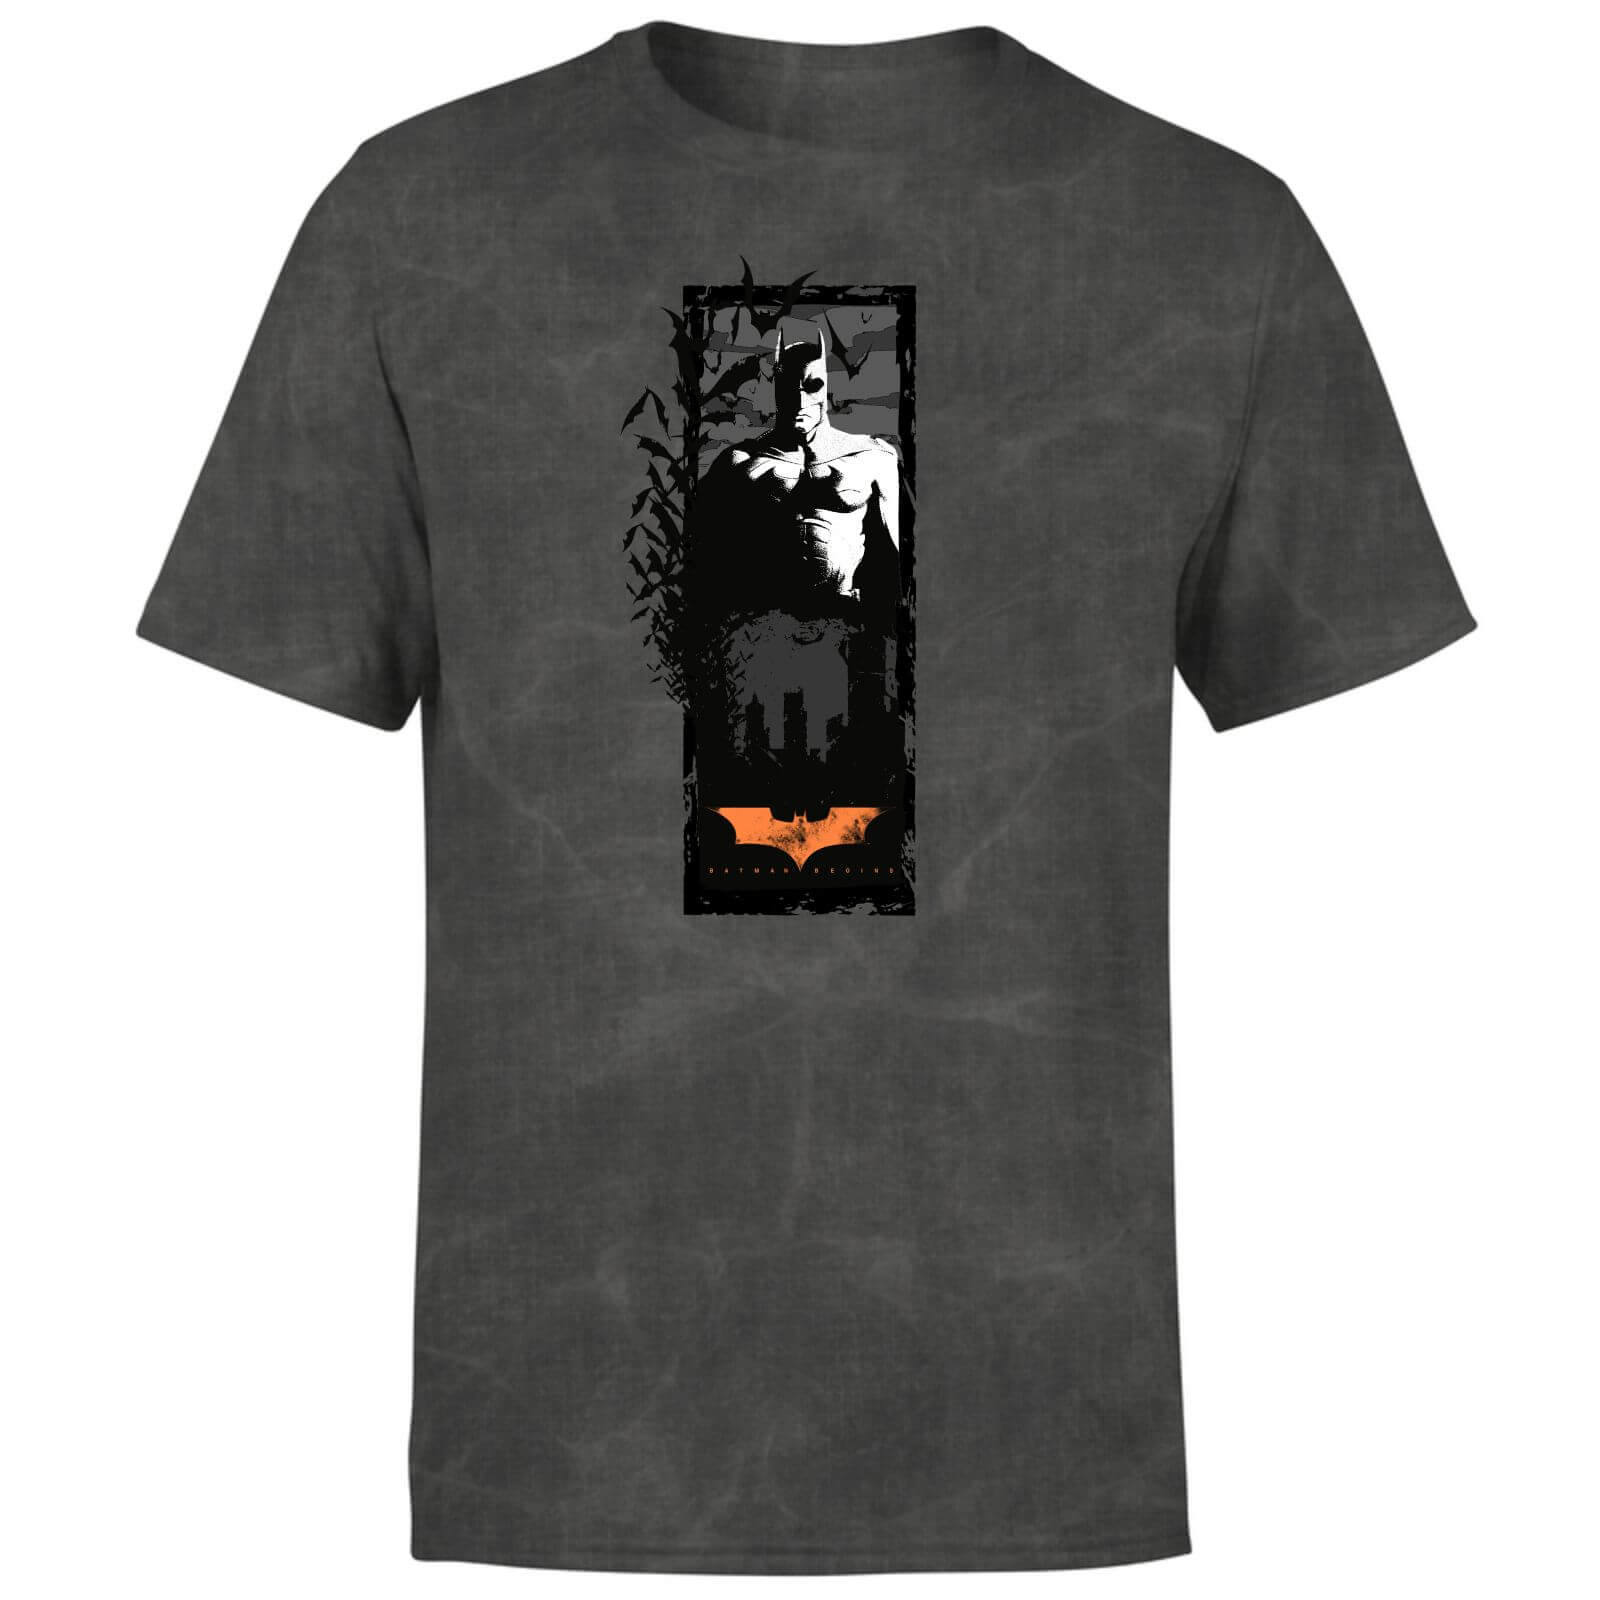 Batman Begins More Than A Man Unisex T-Shirt - Schwarz Acid Wash - S - Schwarz